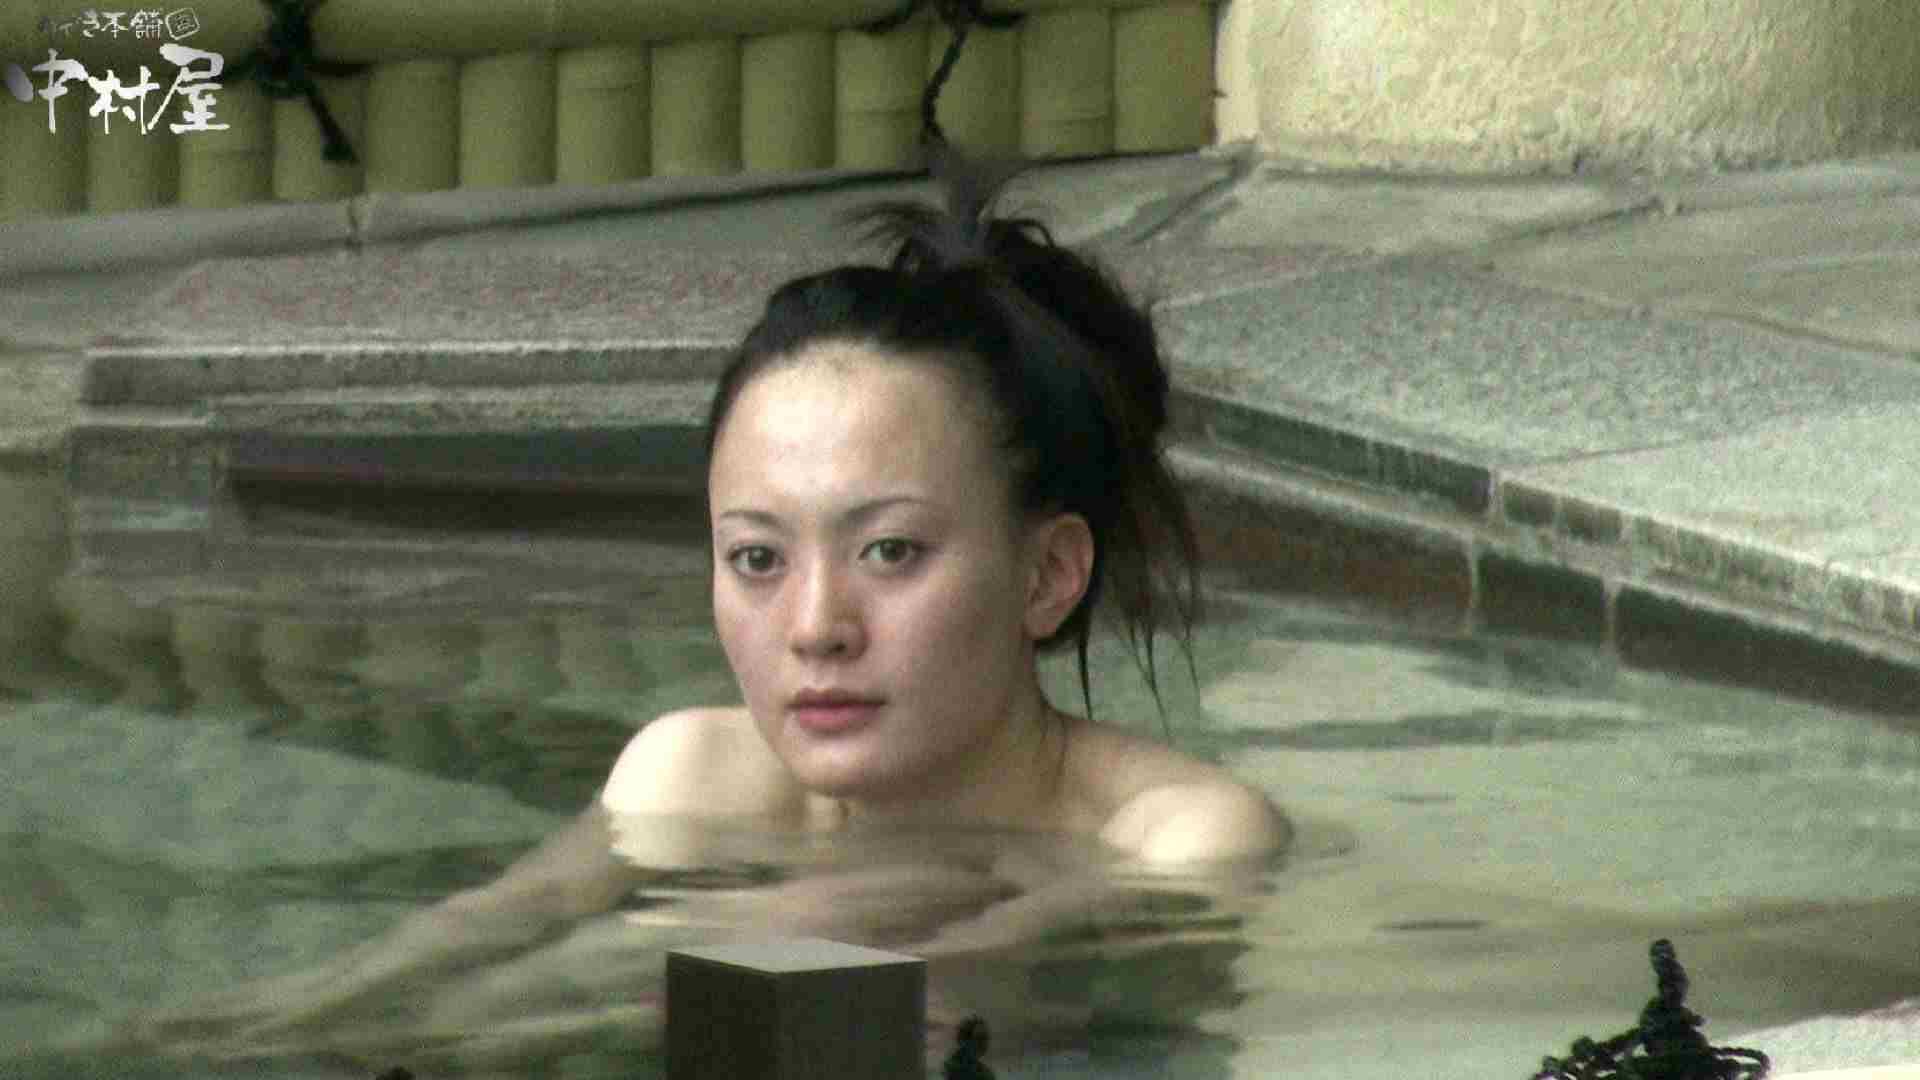 Aquaな露天風呂Vol.900 美しいOLの裸体   露天風呂突入  86pic 52